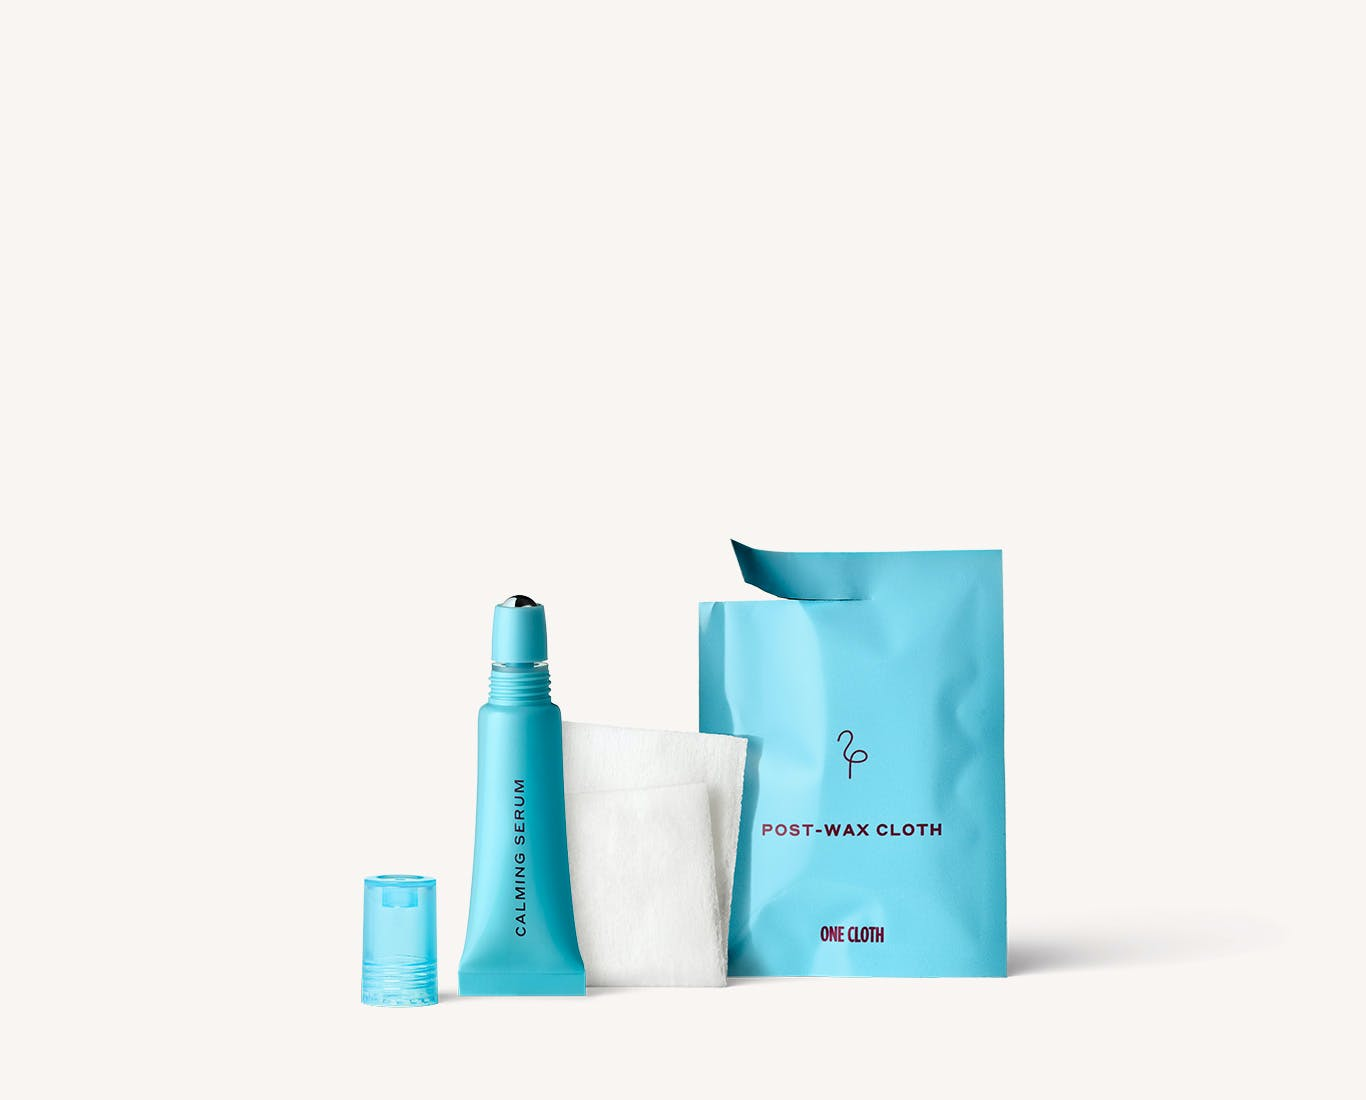 Flamingo Post Wax Cloth and Calming serum